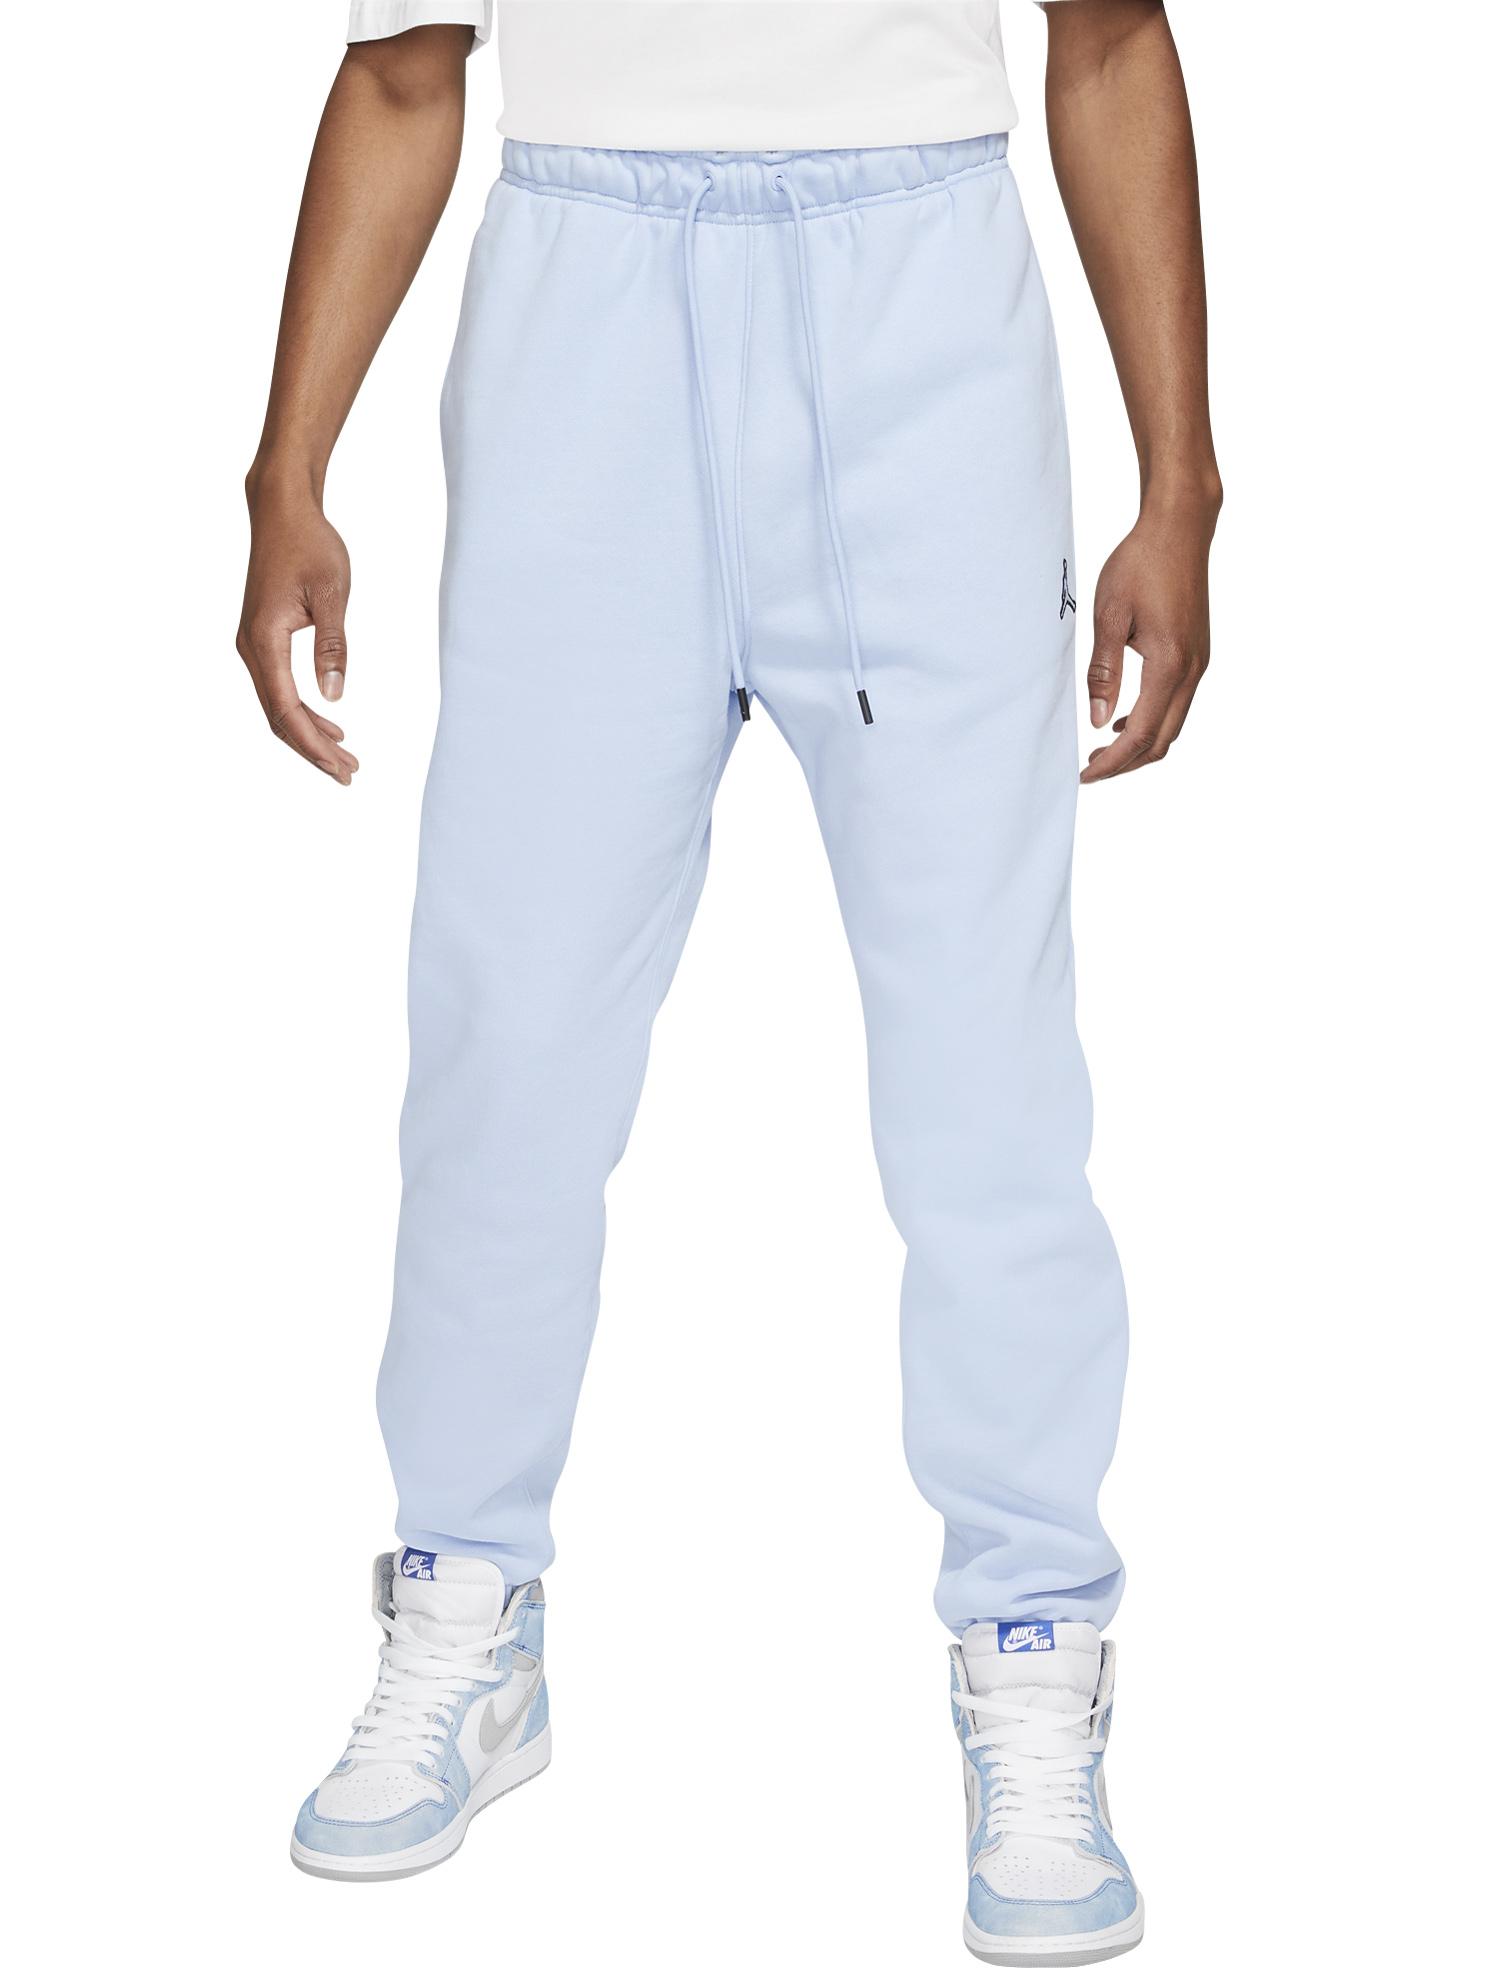 jordan-1-high-hyper-royal-jogger-pants-1